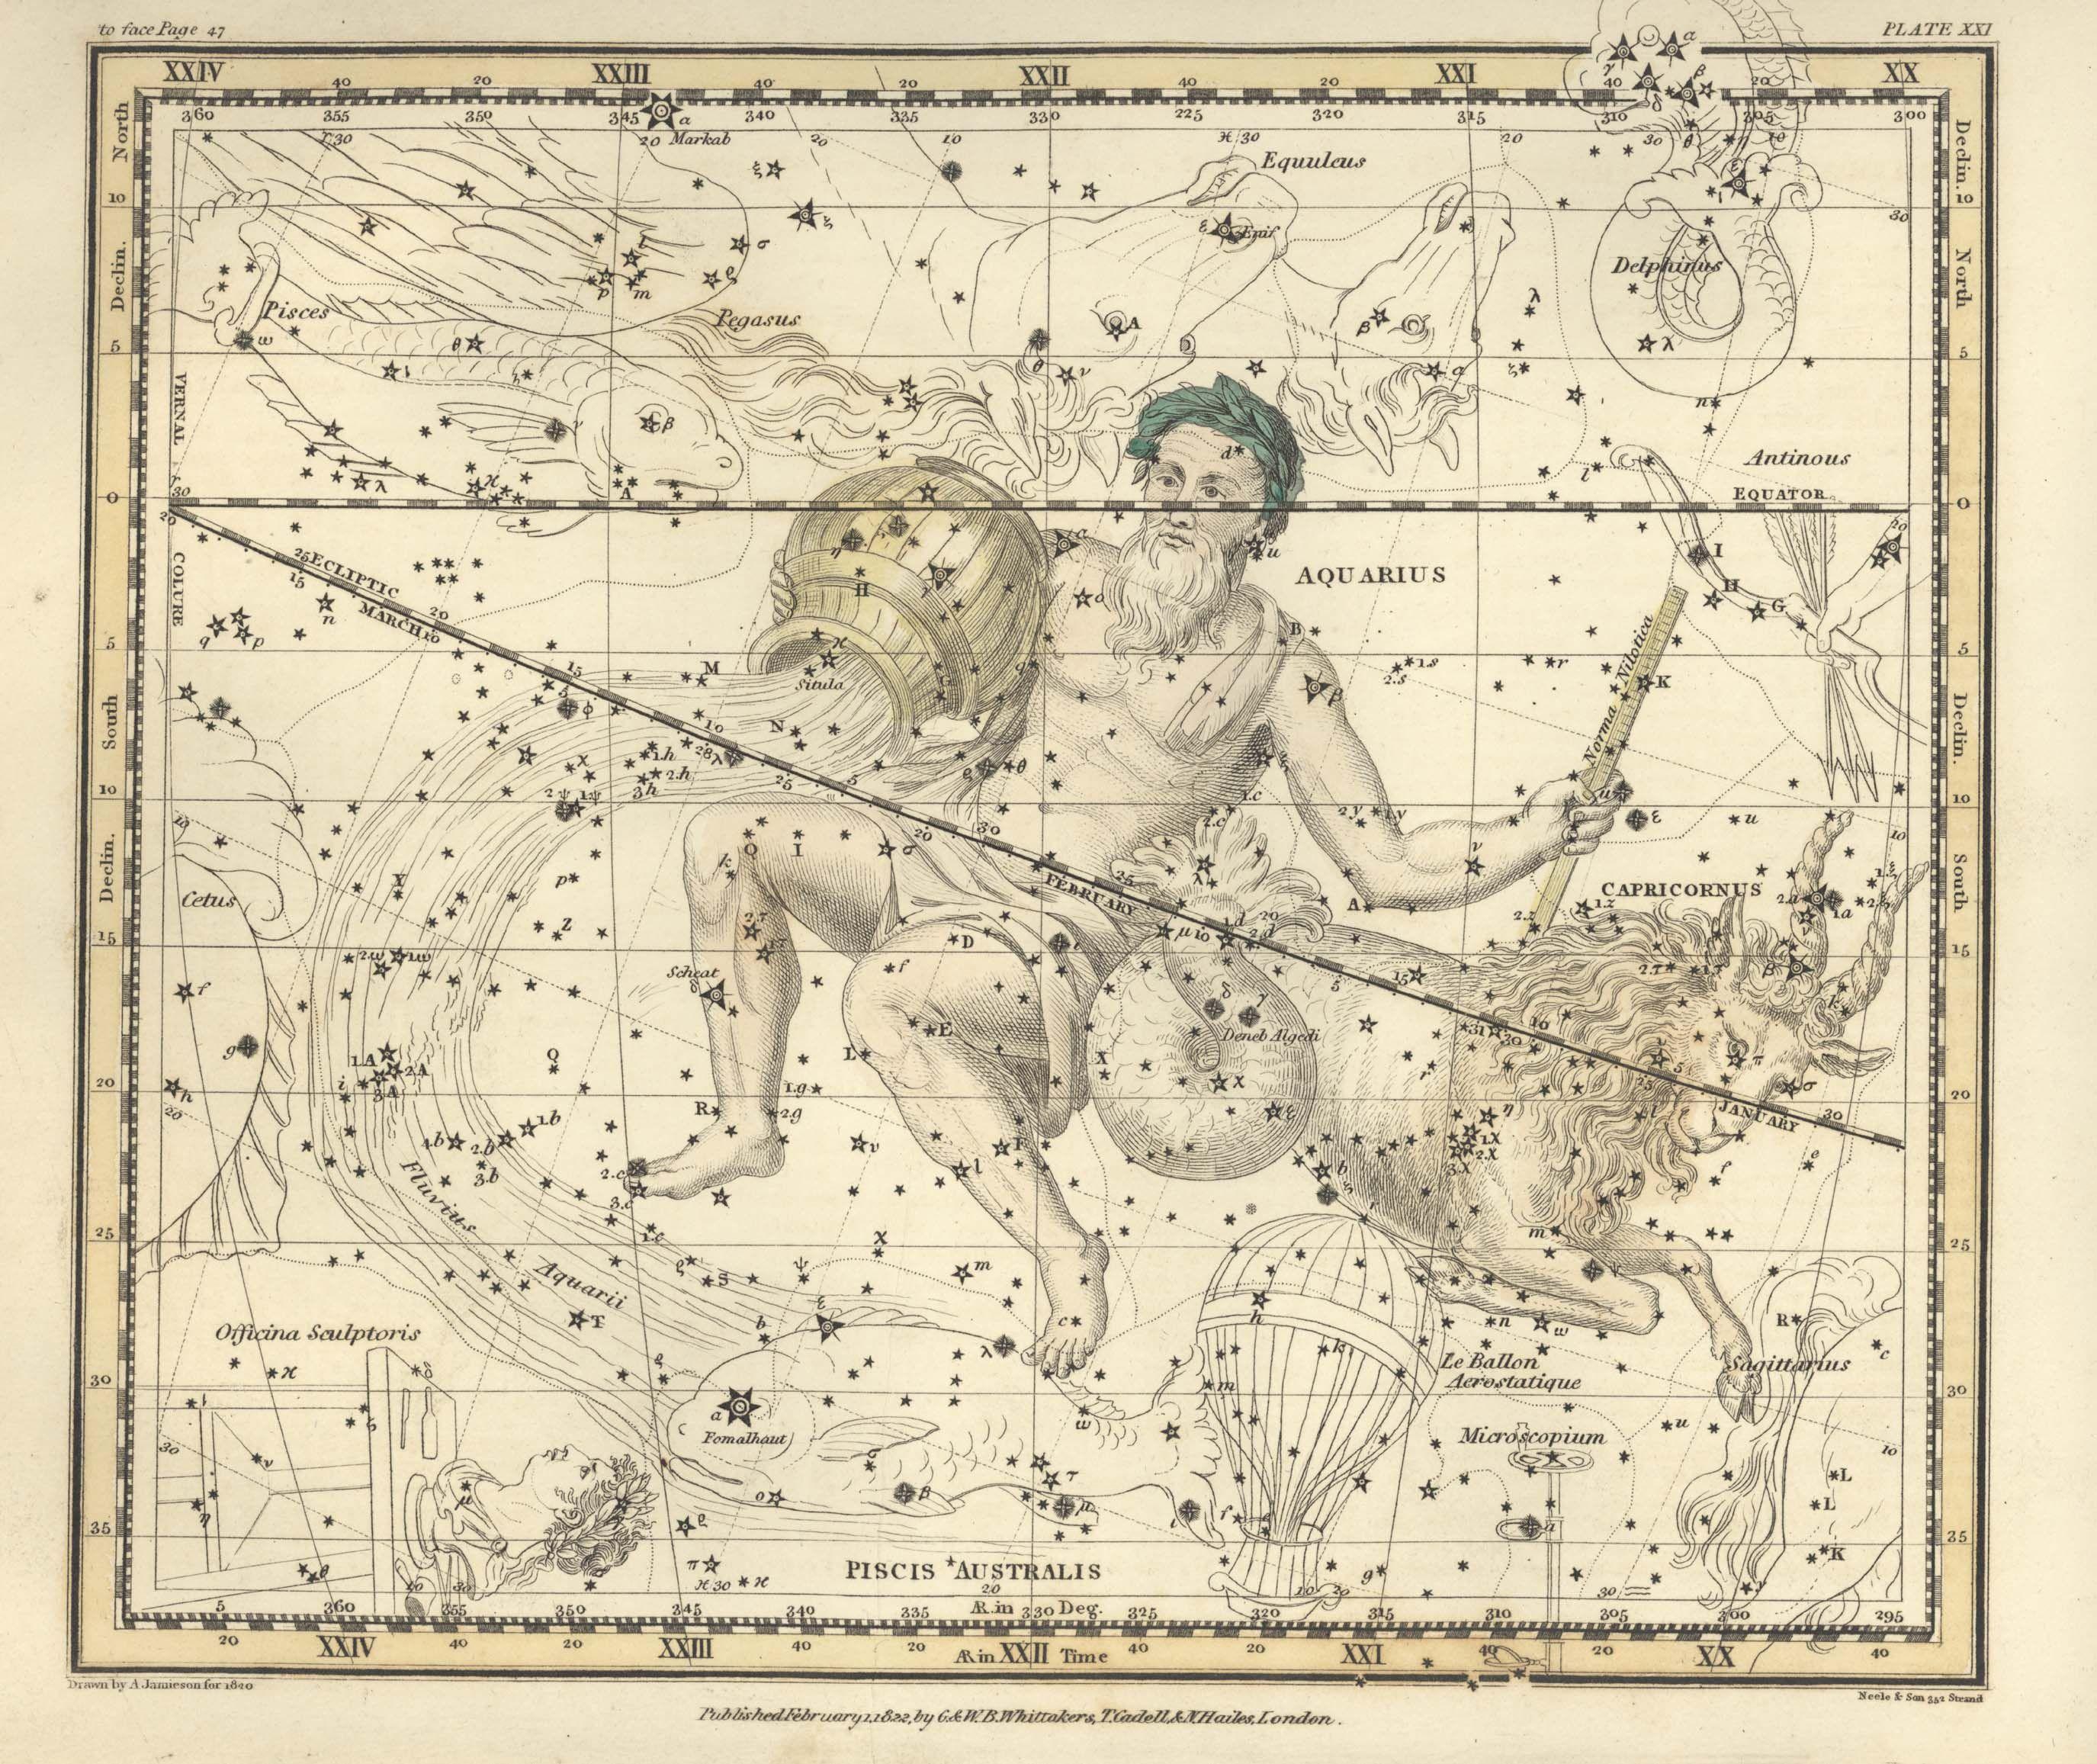 Aquarius and Capricornus - Alexander Jamieson - Celestial Atlas